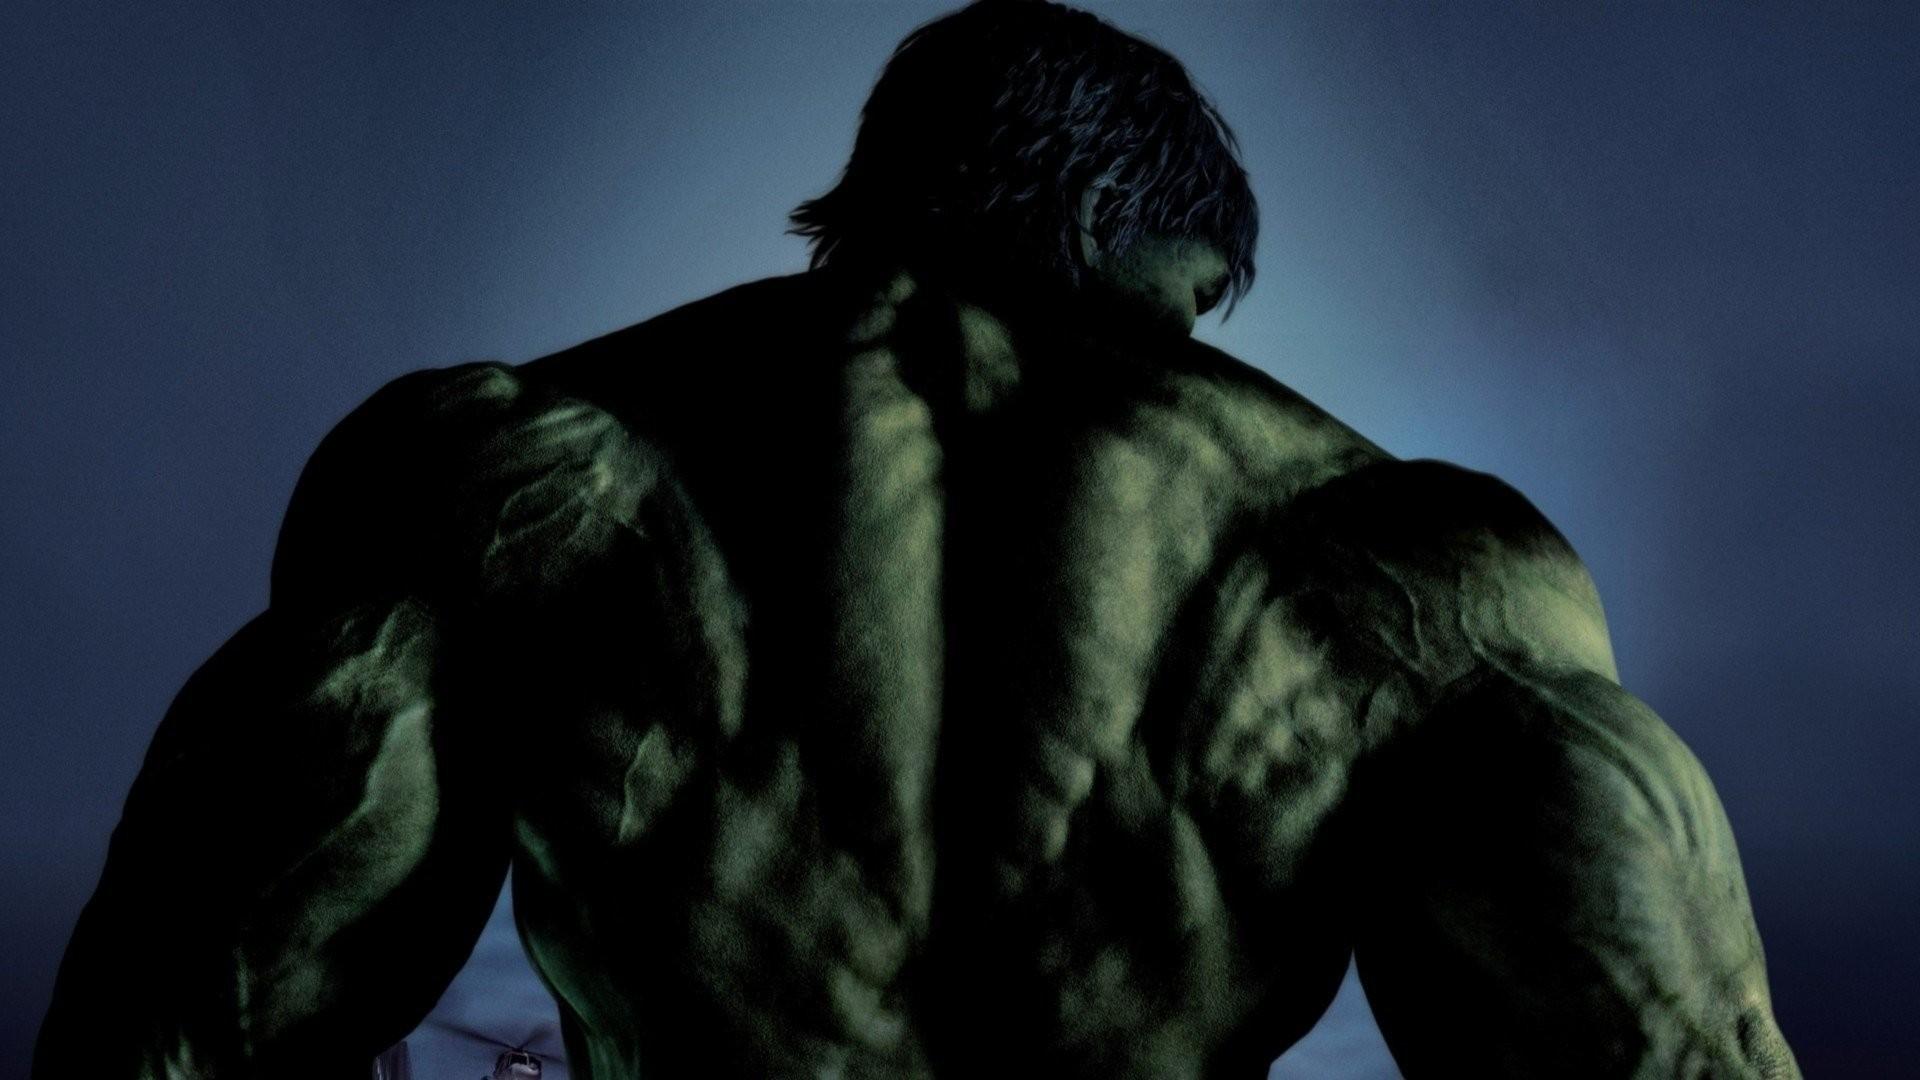 hulk wallpaper 2018 (65+ images)